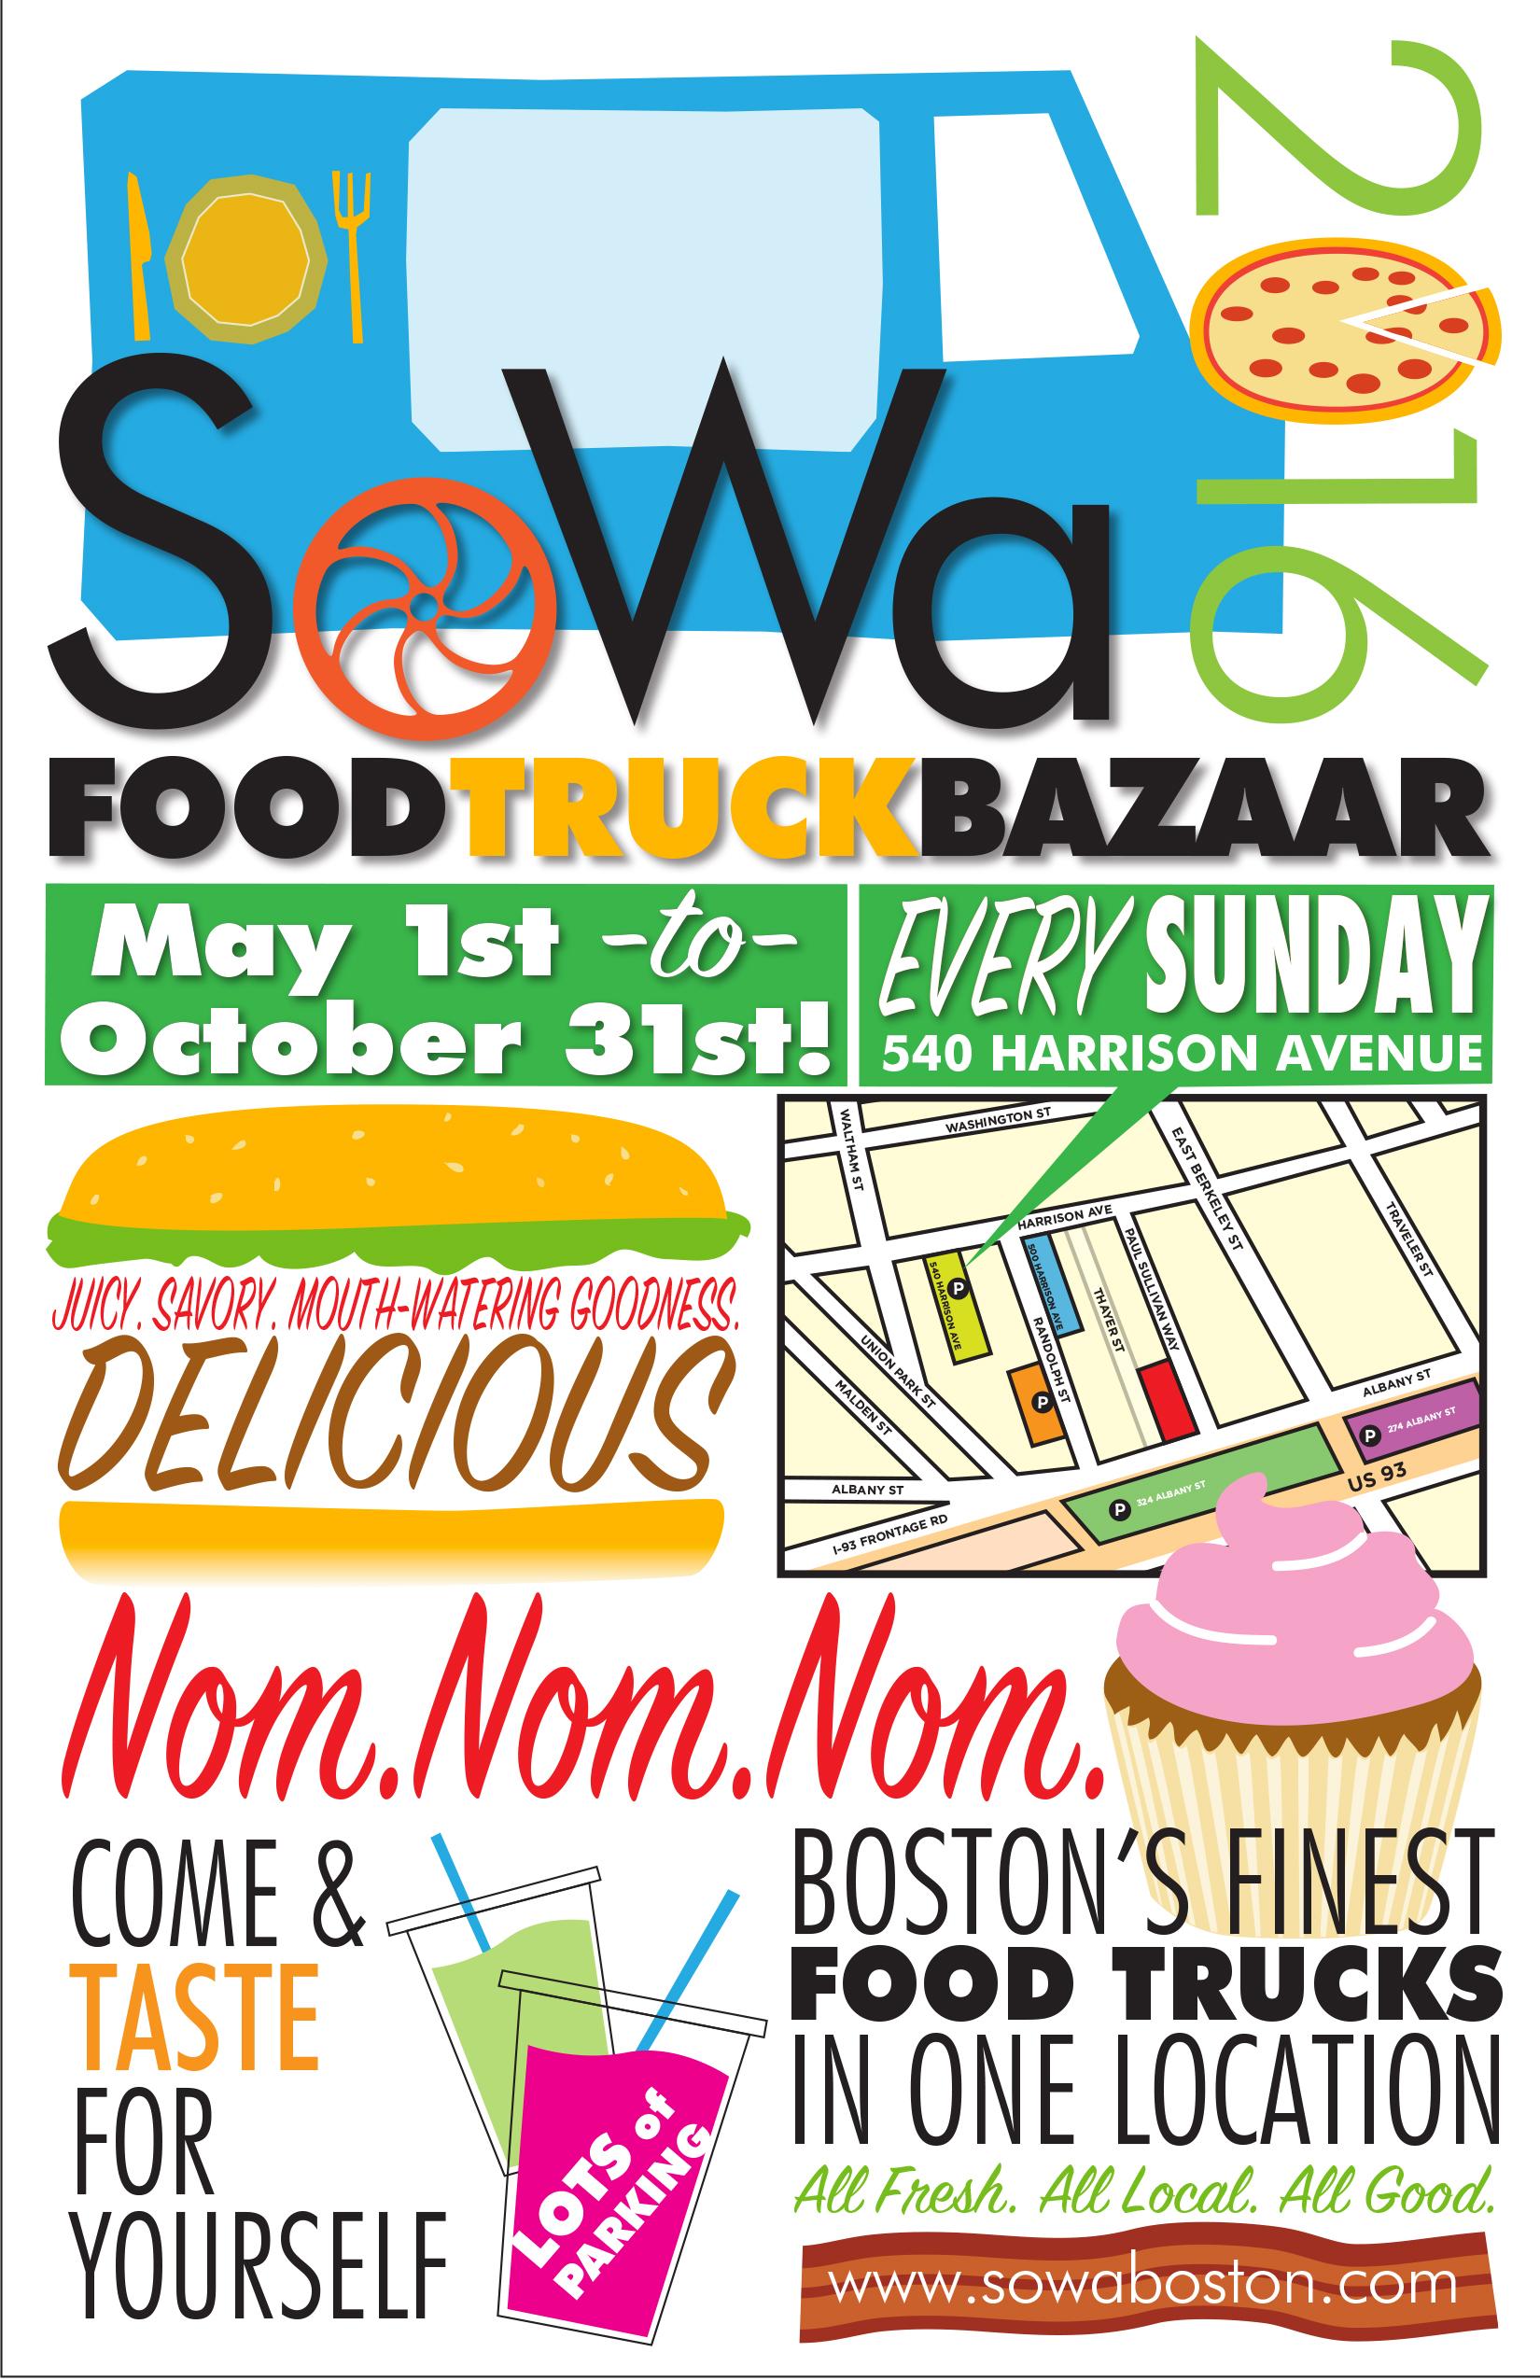 Sowa food truck bazaar